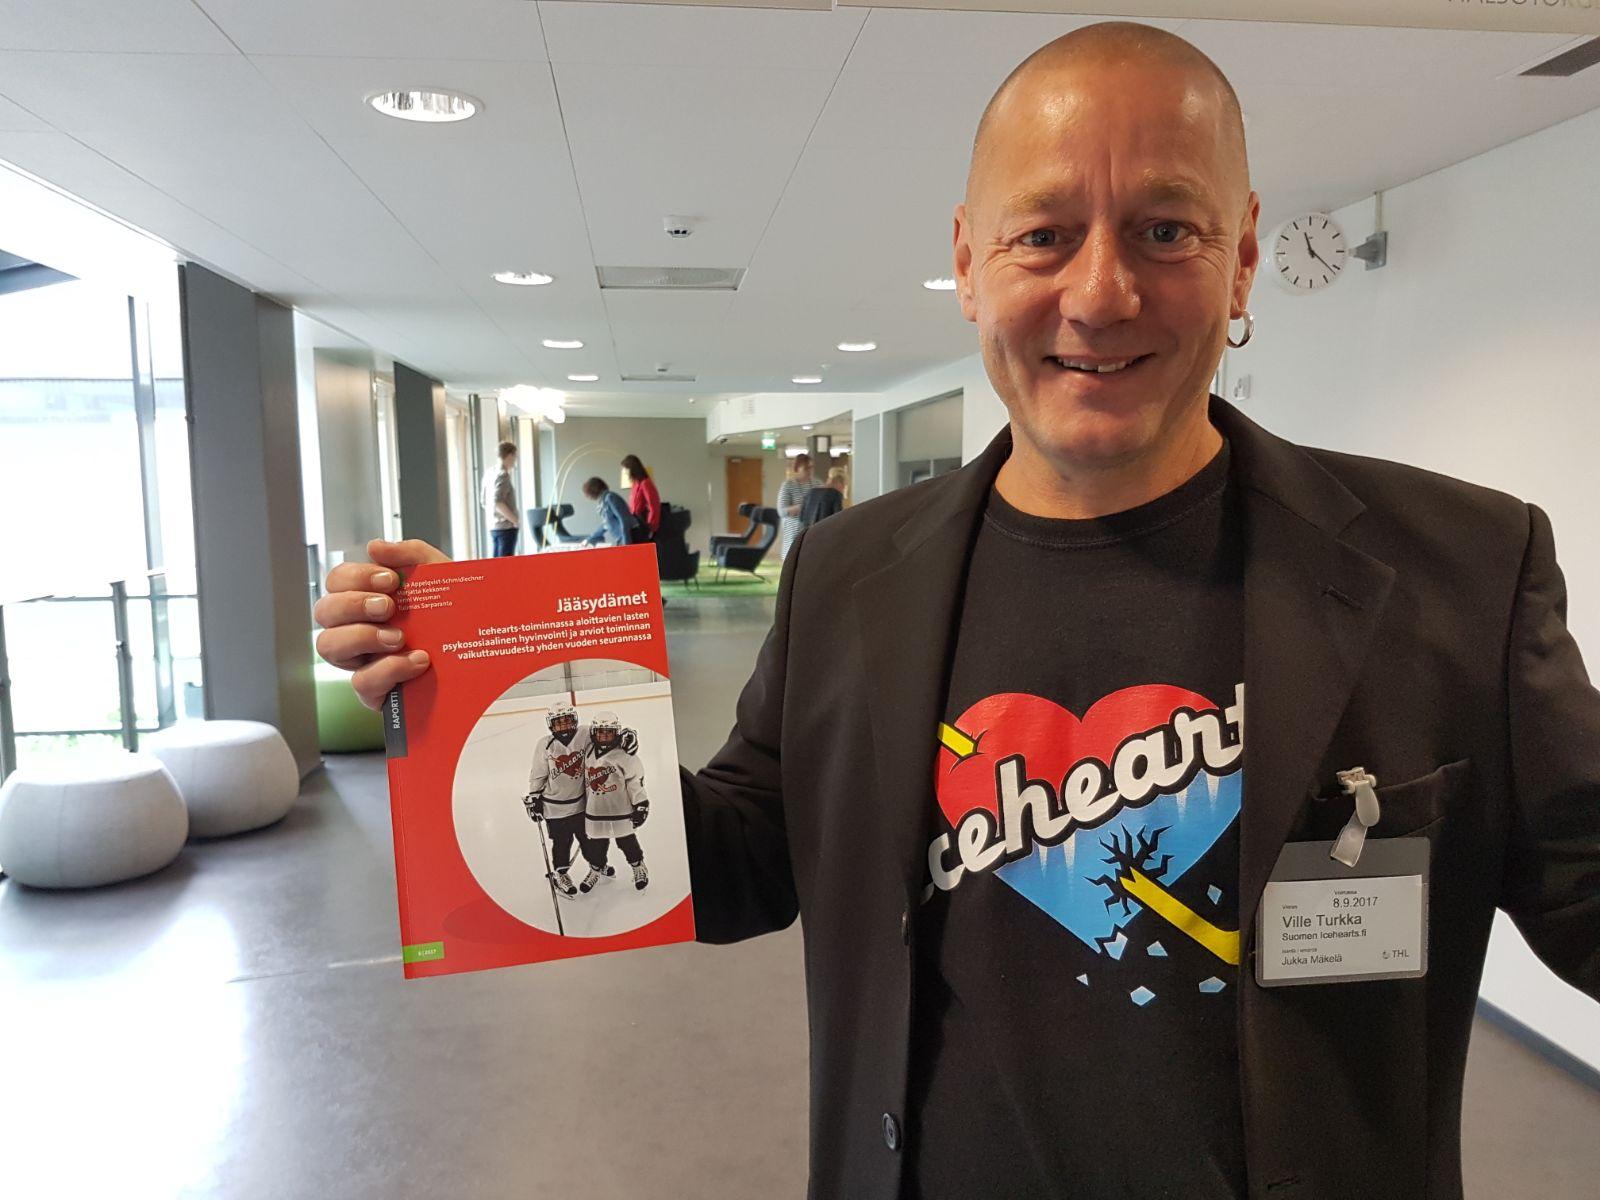 Finnish social worker Ville Turkka